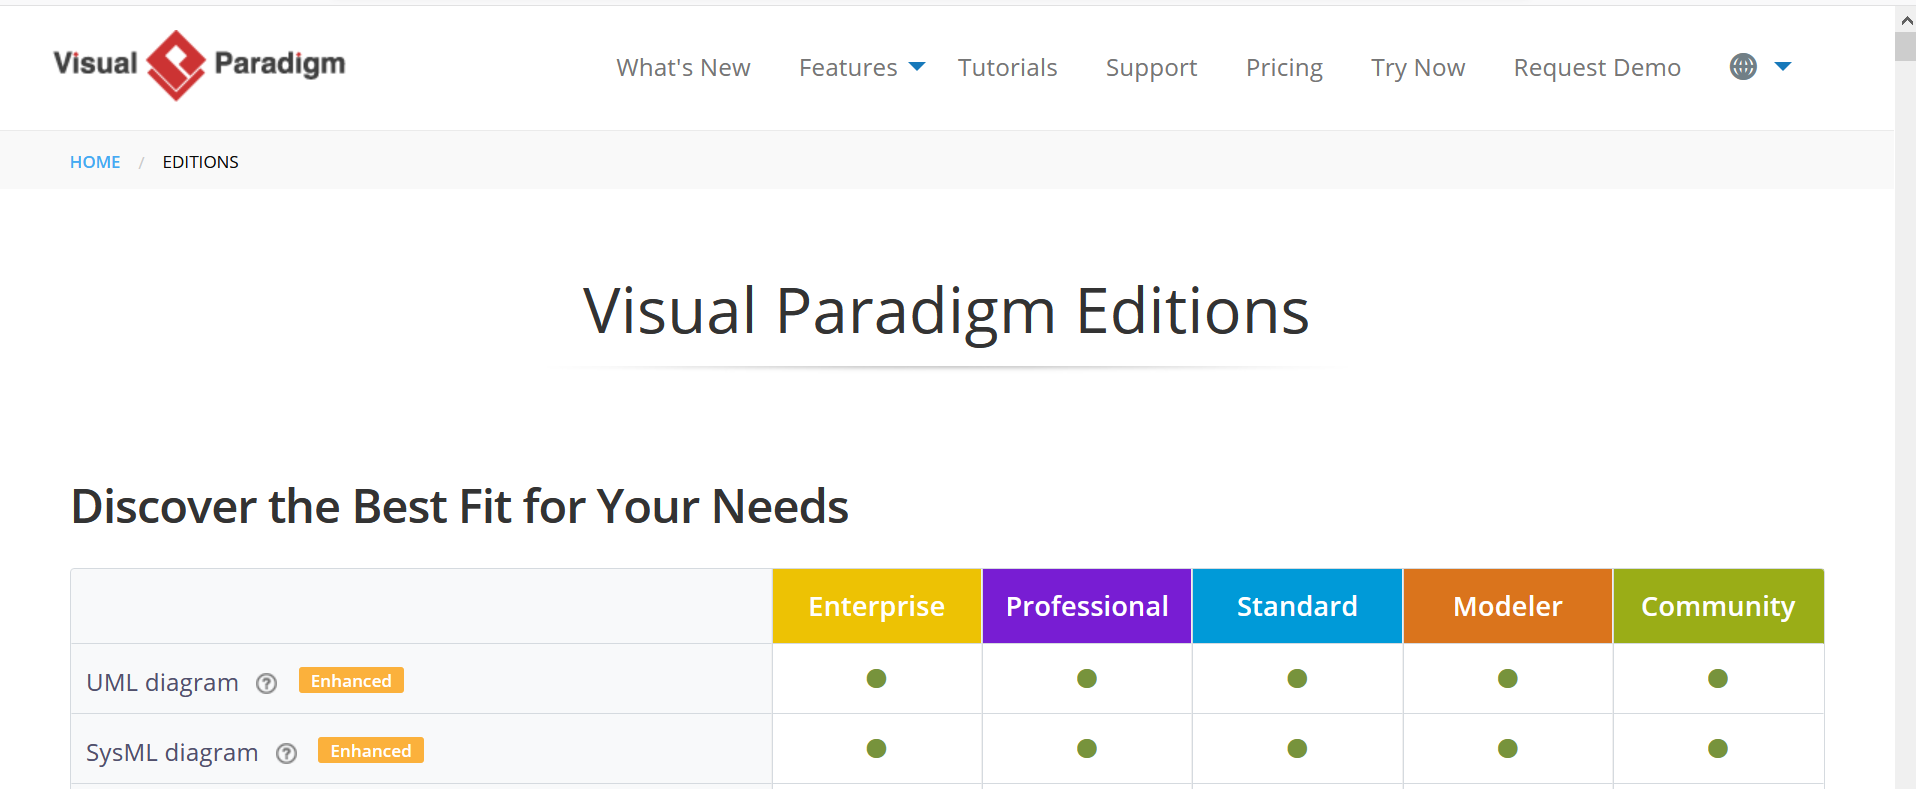 Visual Paradigm Editions